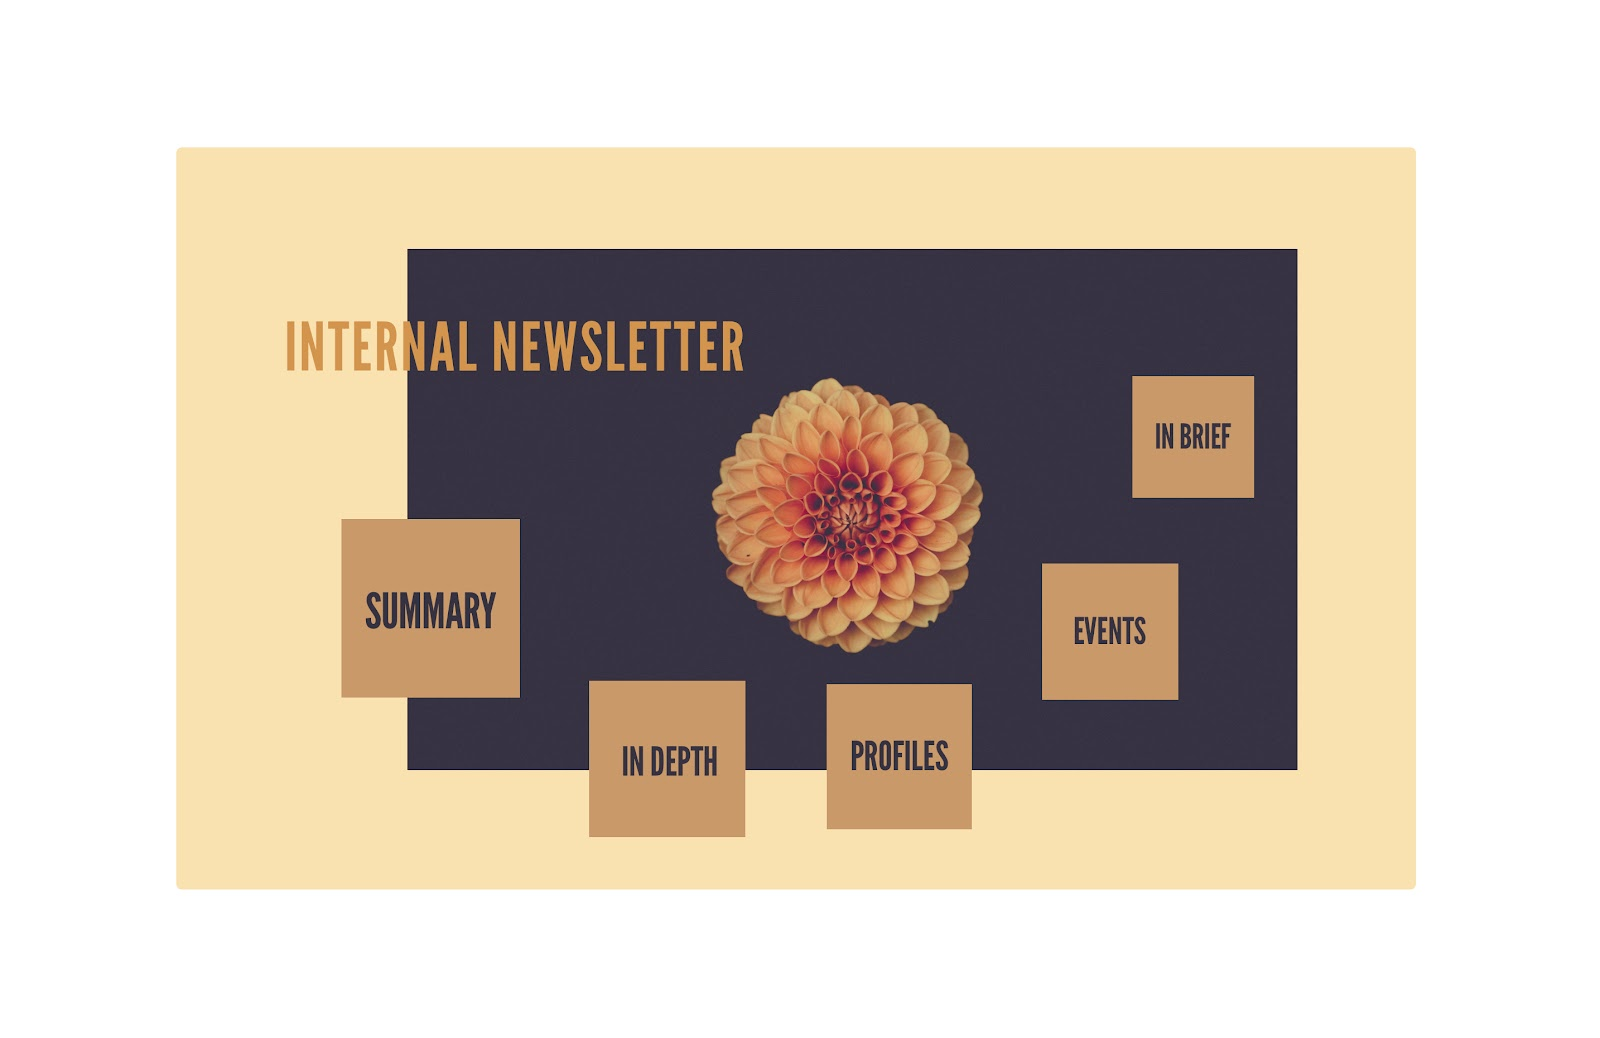 Combine design elements to create a stunning newsletter Prezi presentation.